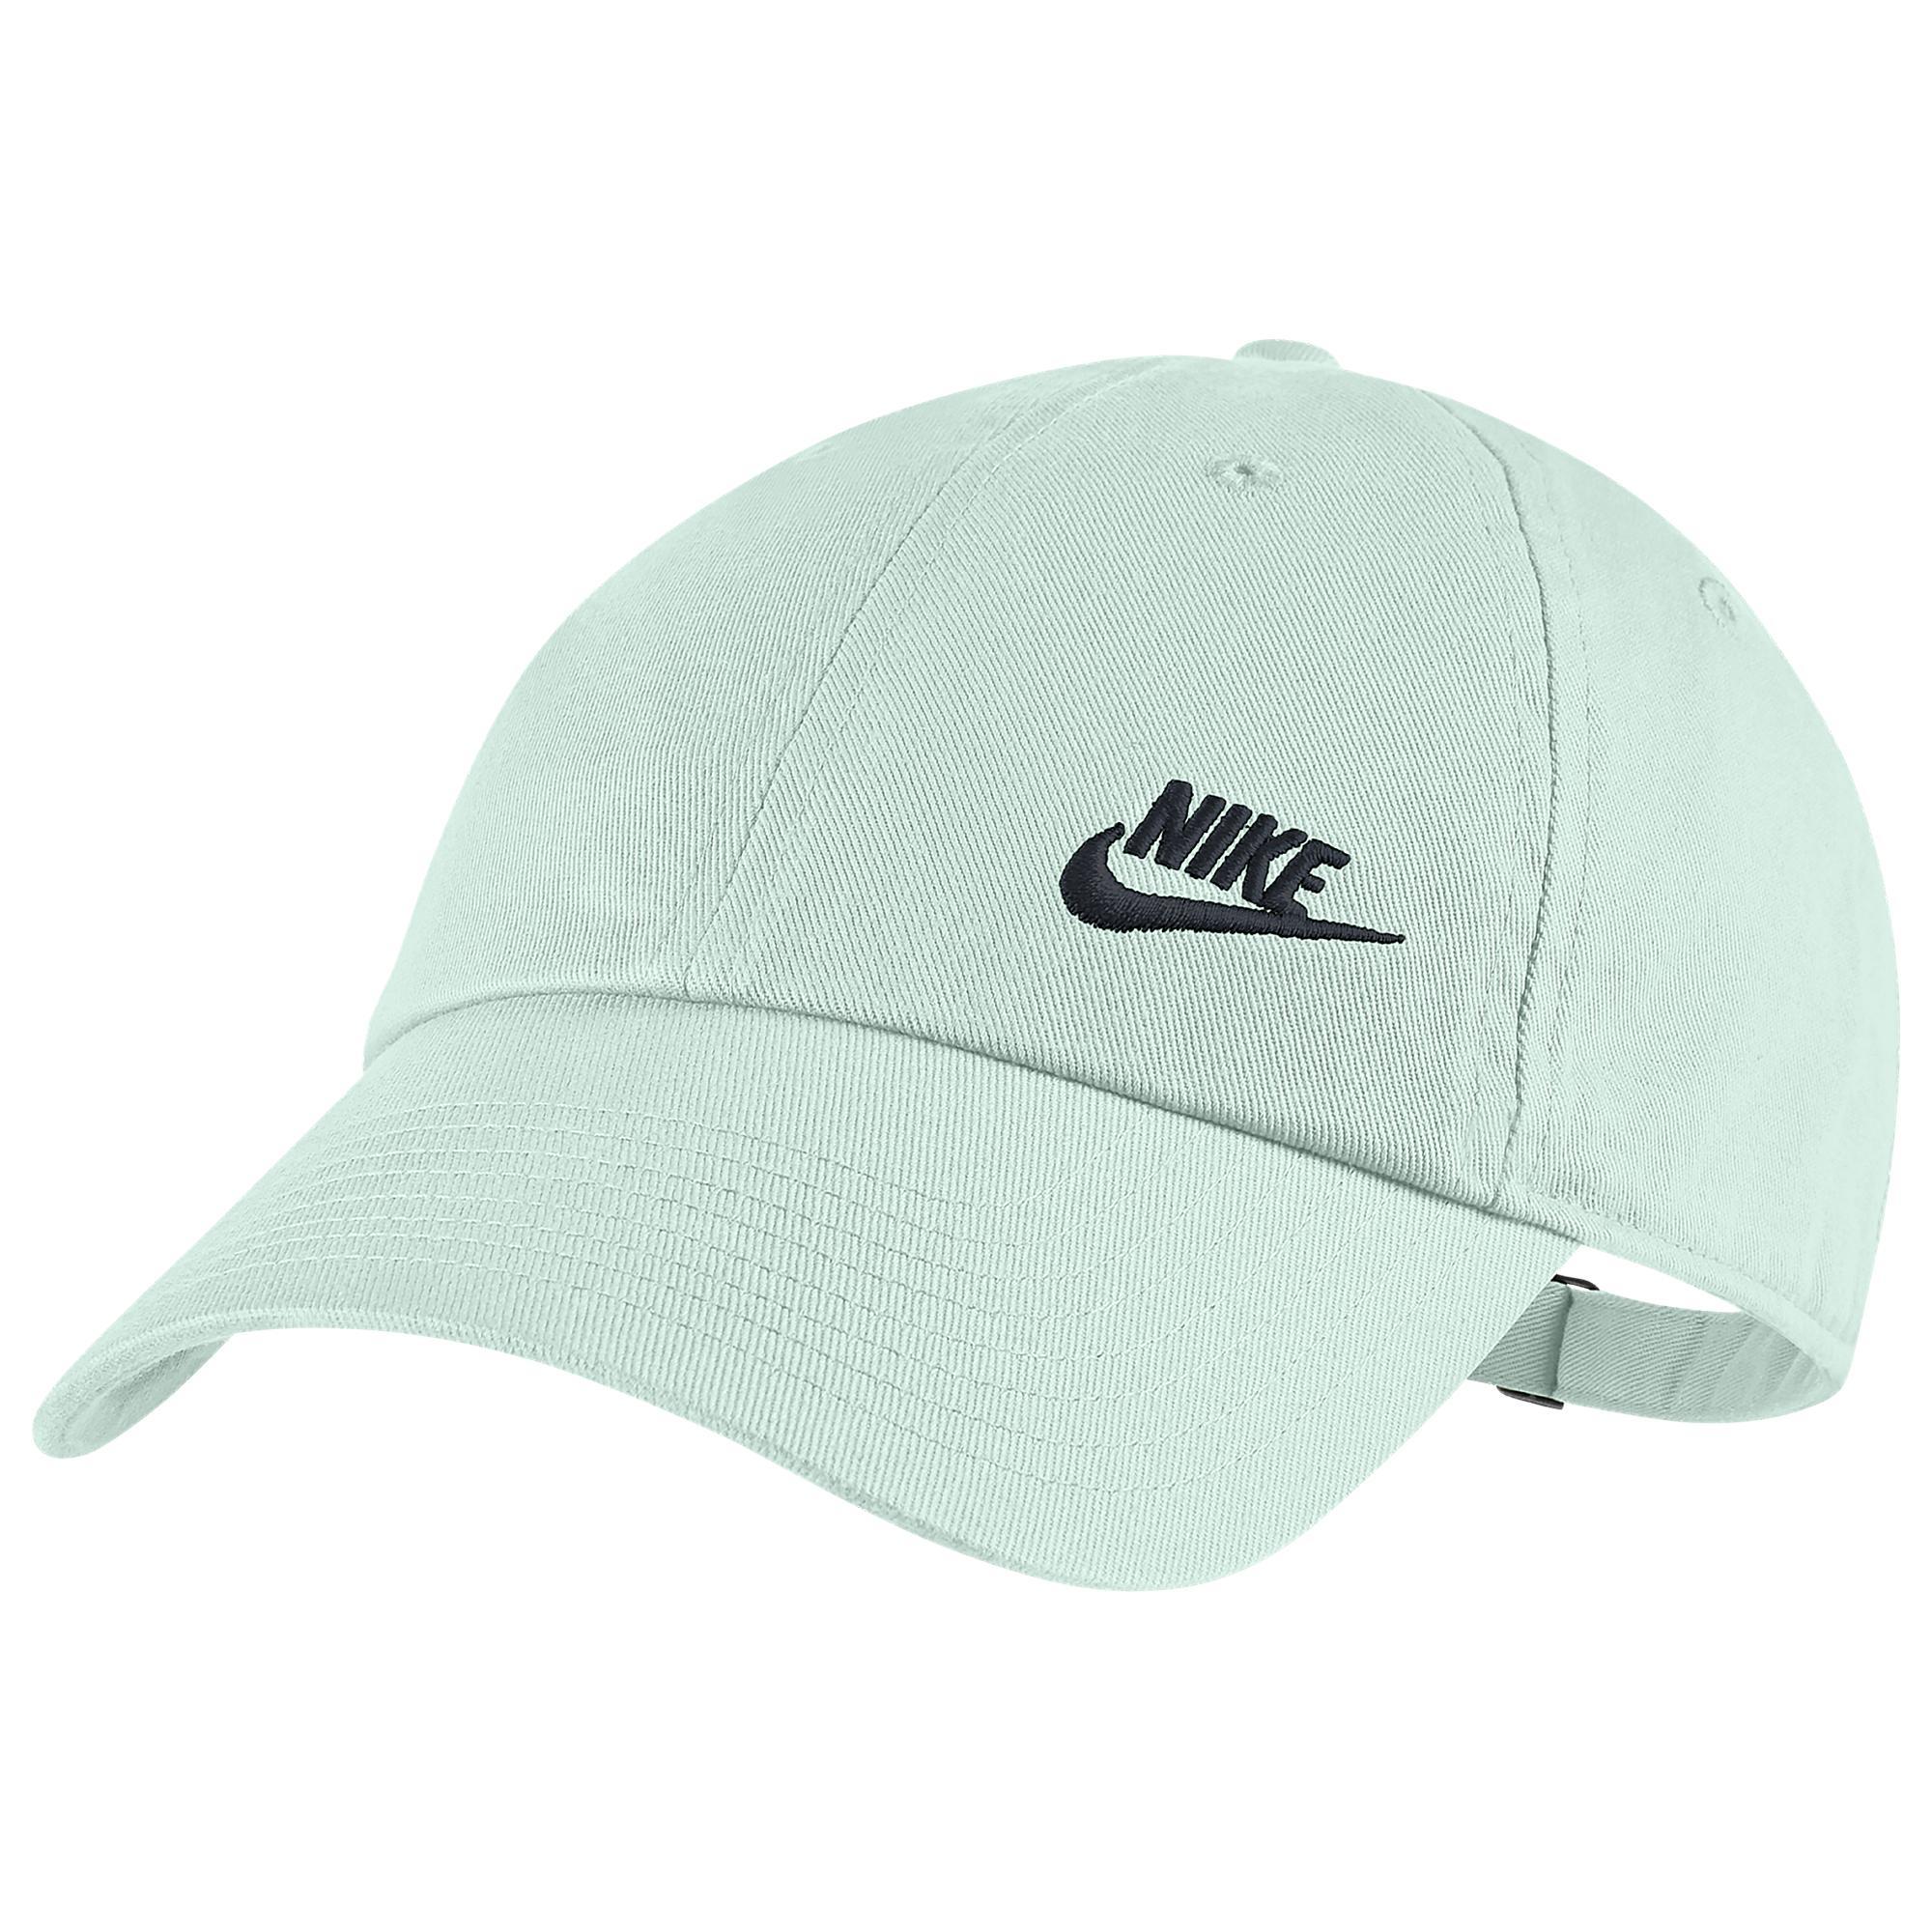 c5bdb2ed7db Lyst - Nike Heritage 86 Twill Hat in Gray